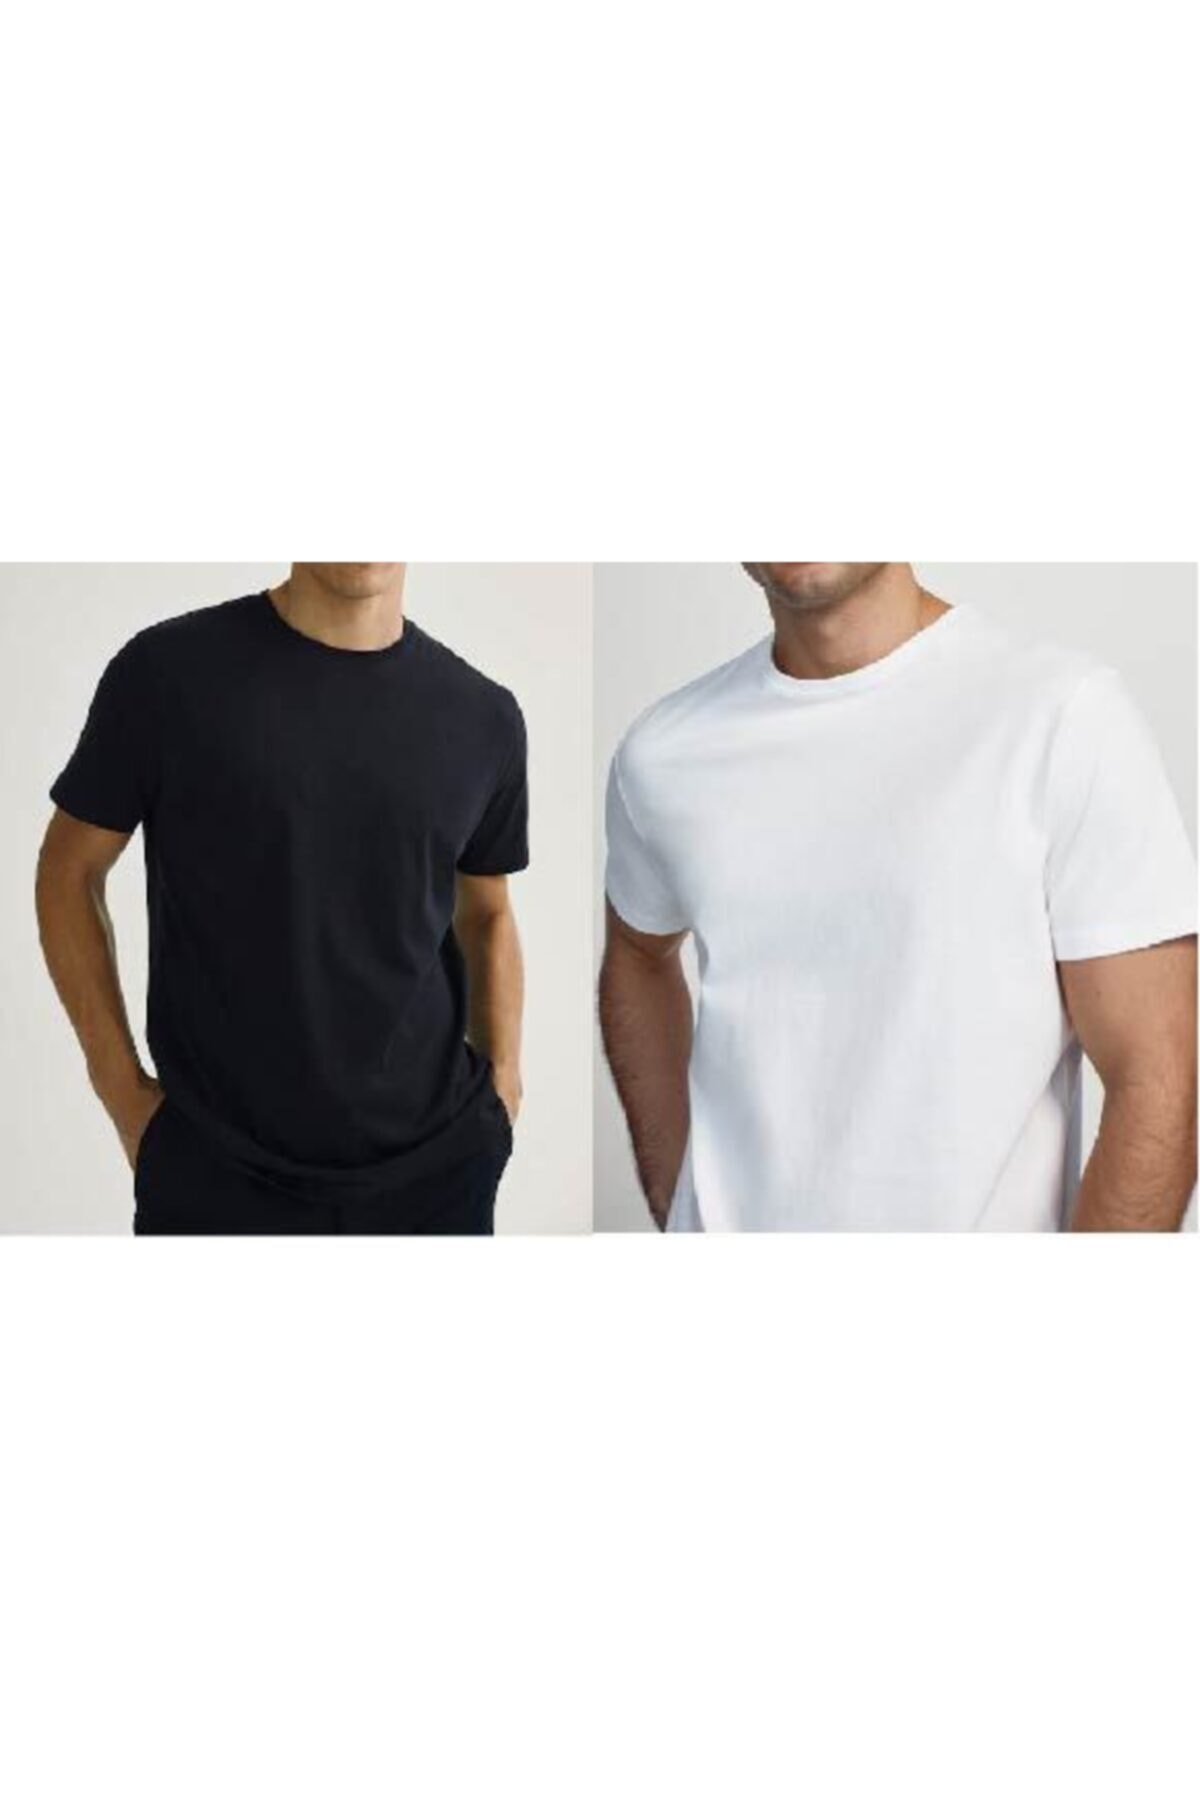 ROS Erkek Çok Renkli Casual Fit T-shirt 2'li Paket 1